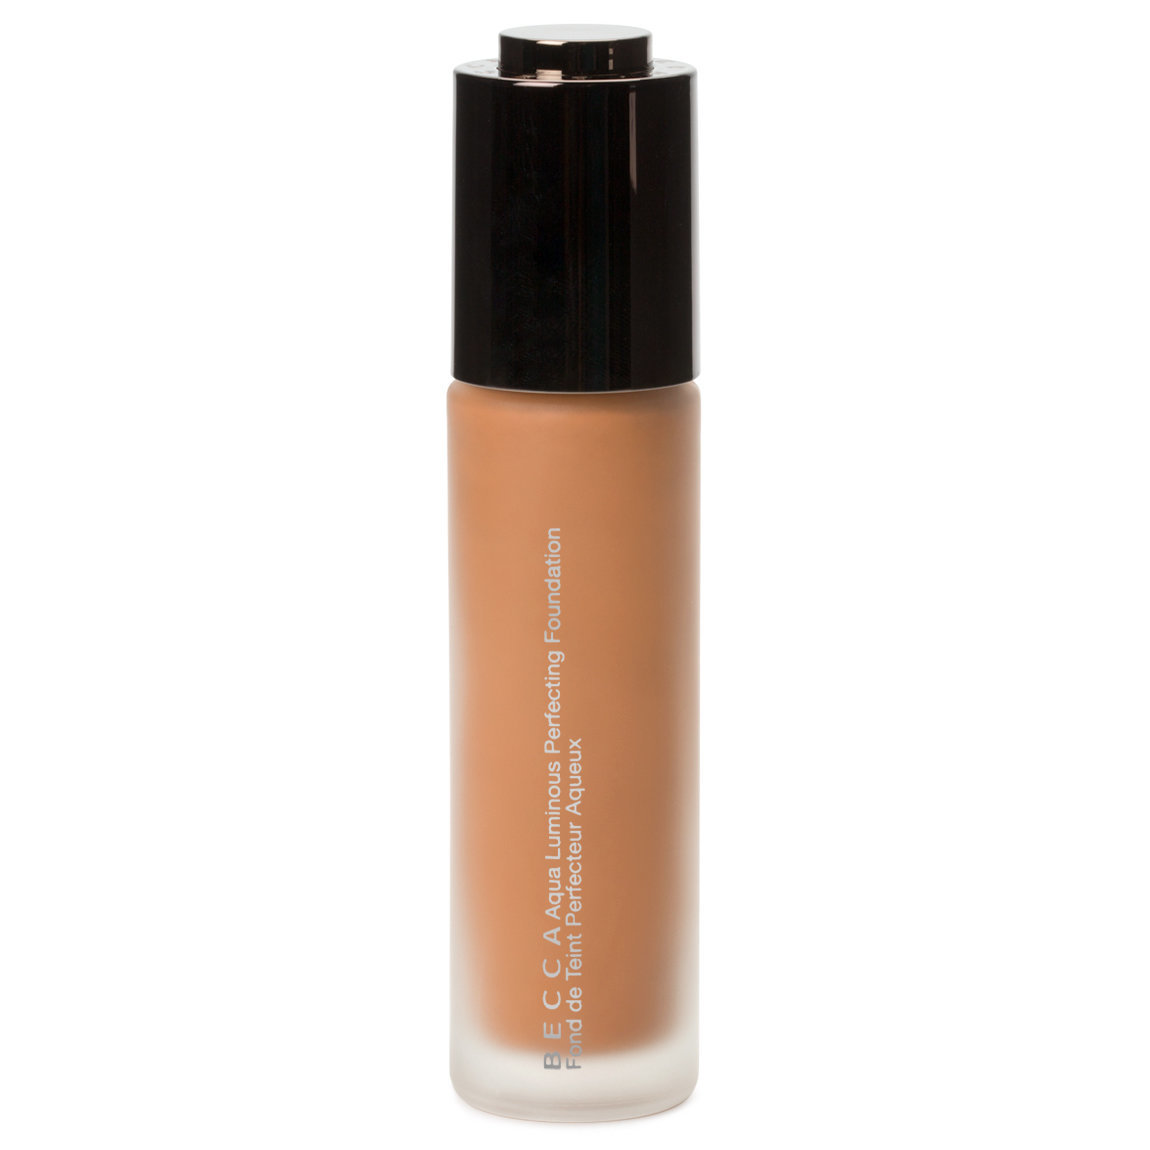 BECCA Cosmetics Aqua Luminous Perfecting Foundation Warm Honey alternative view 1.